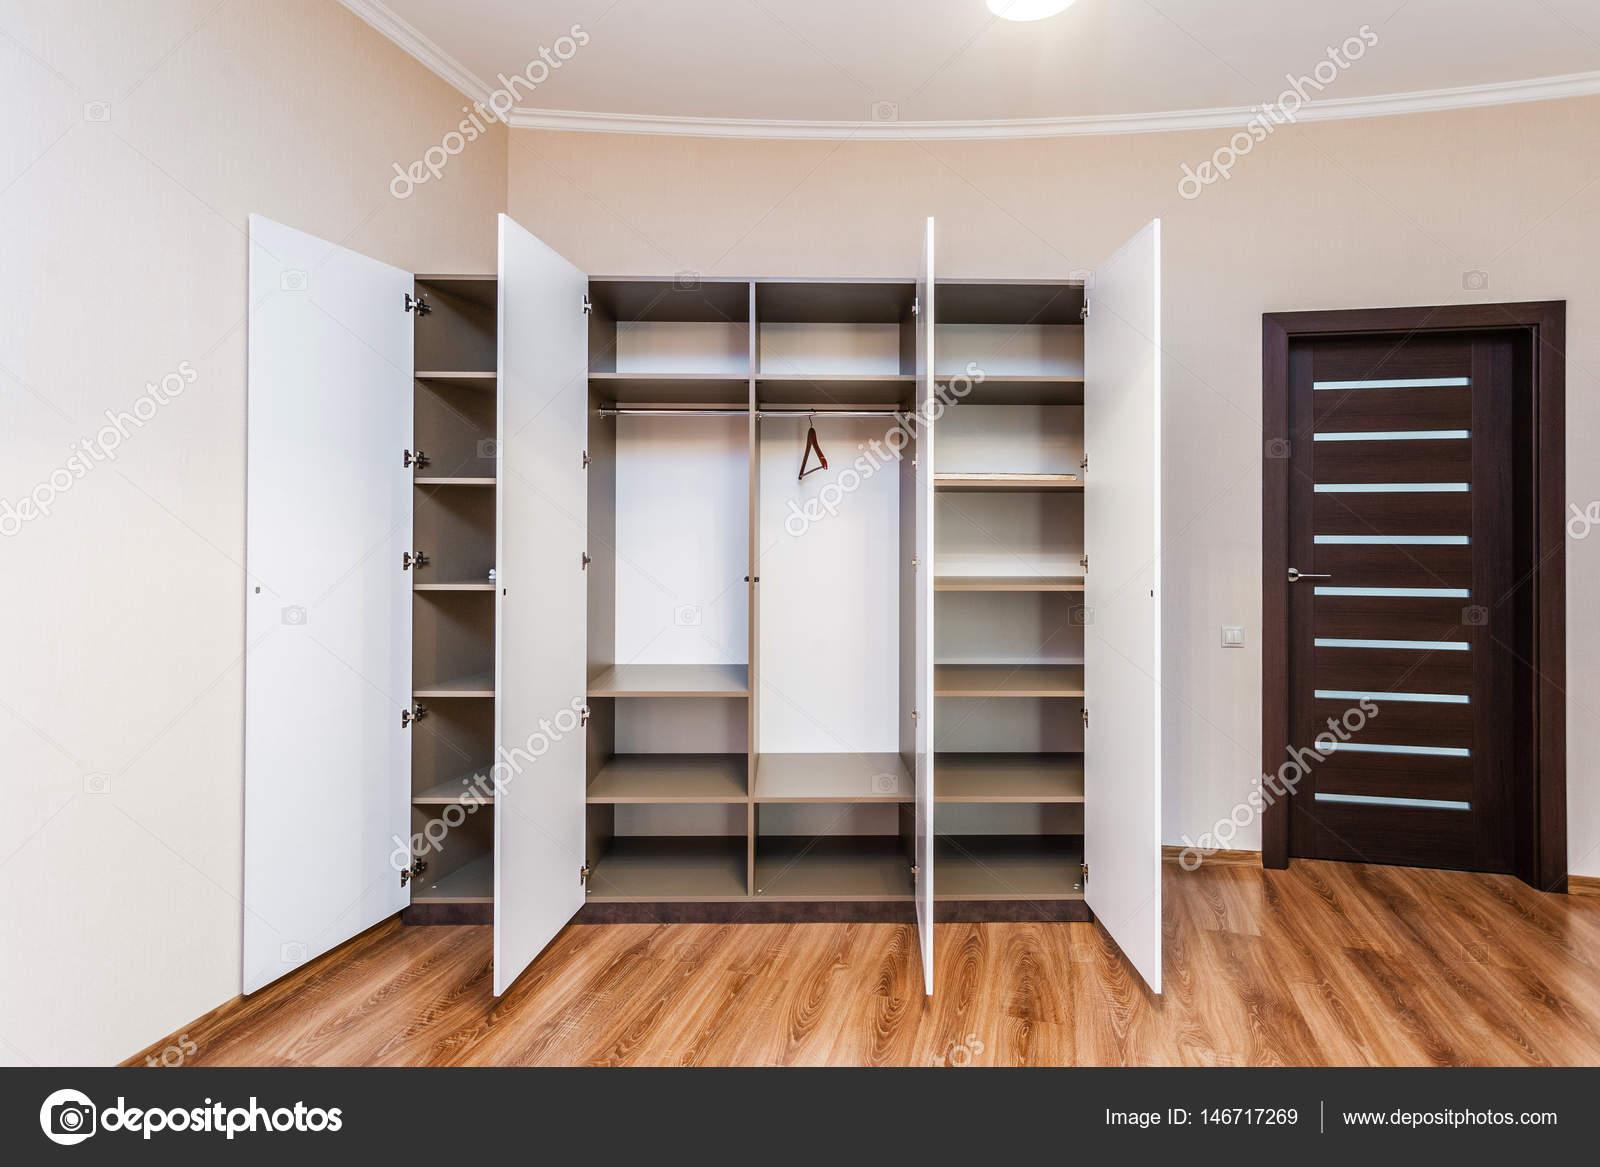 Liebenswert Moderne Garderobe Ideen Von Met Geopende Deuren — Stockfoto